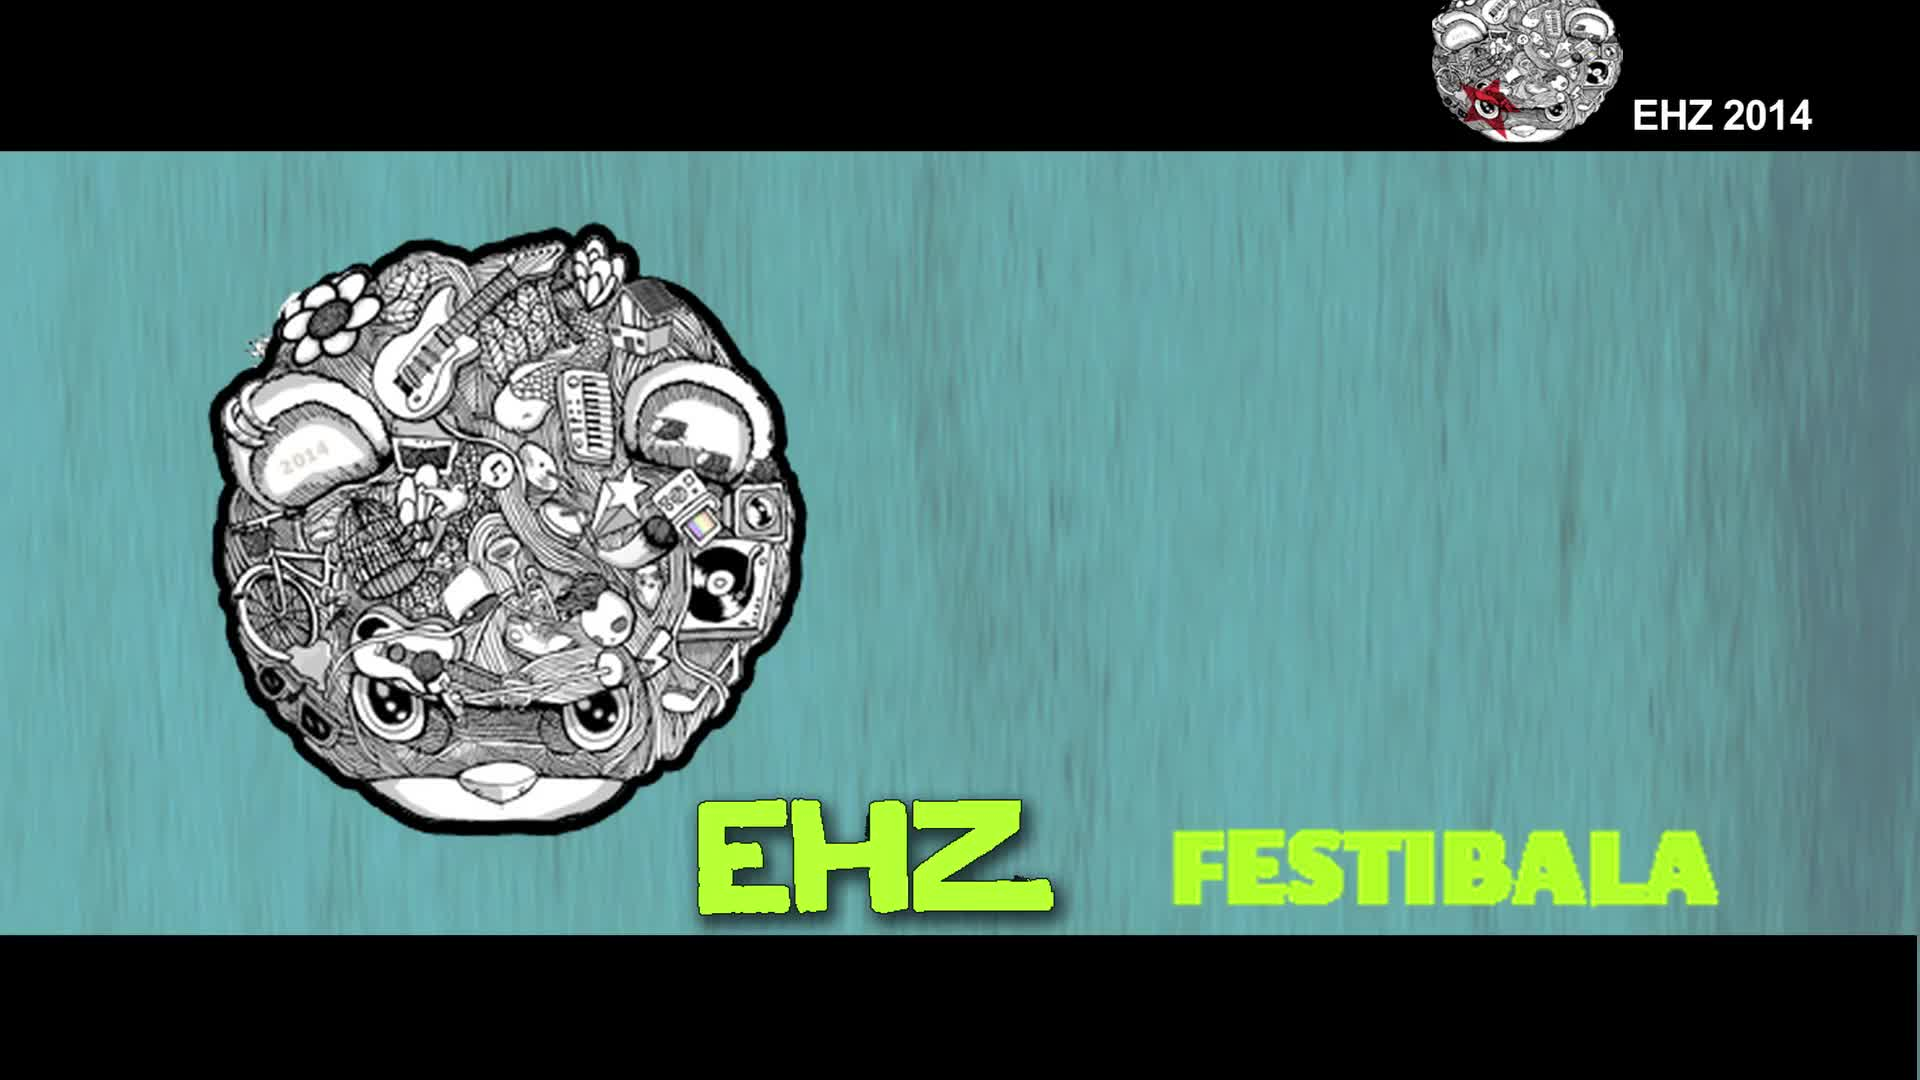 EHZ 2014 - Zea Mays